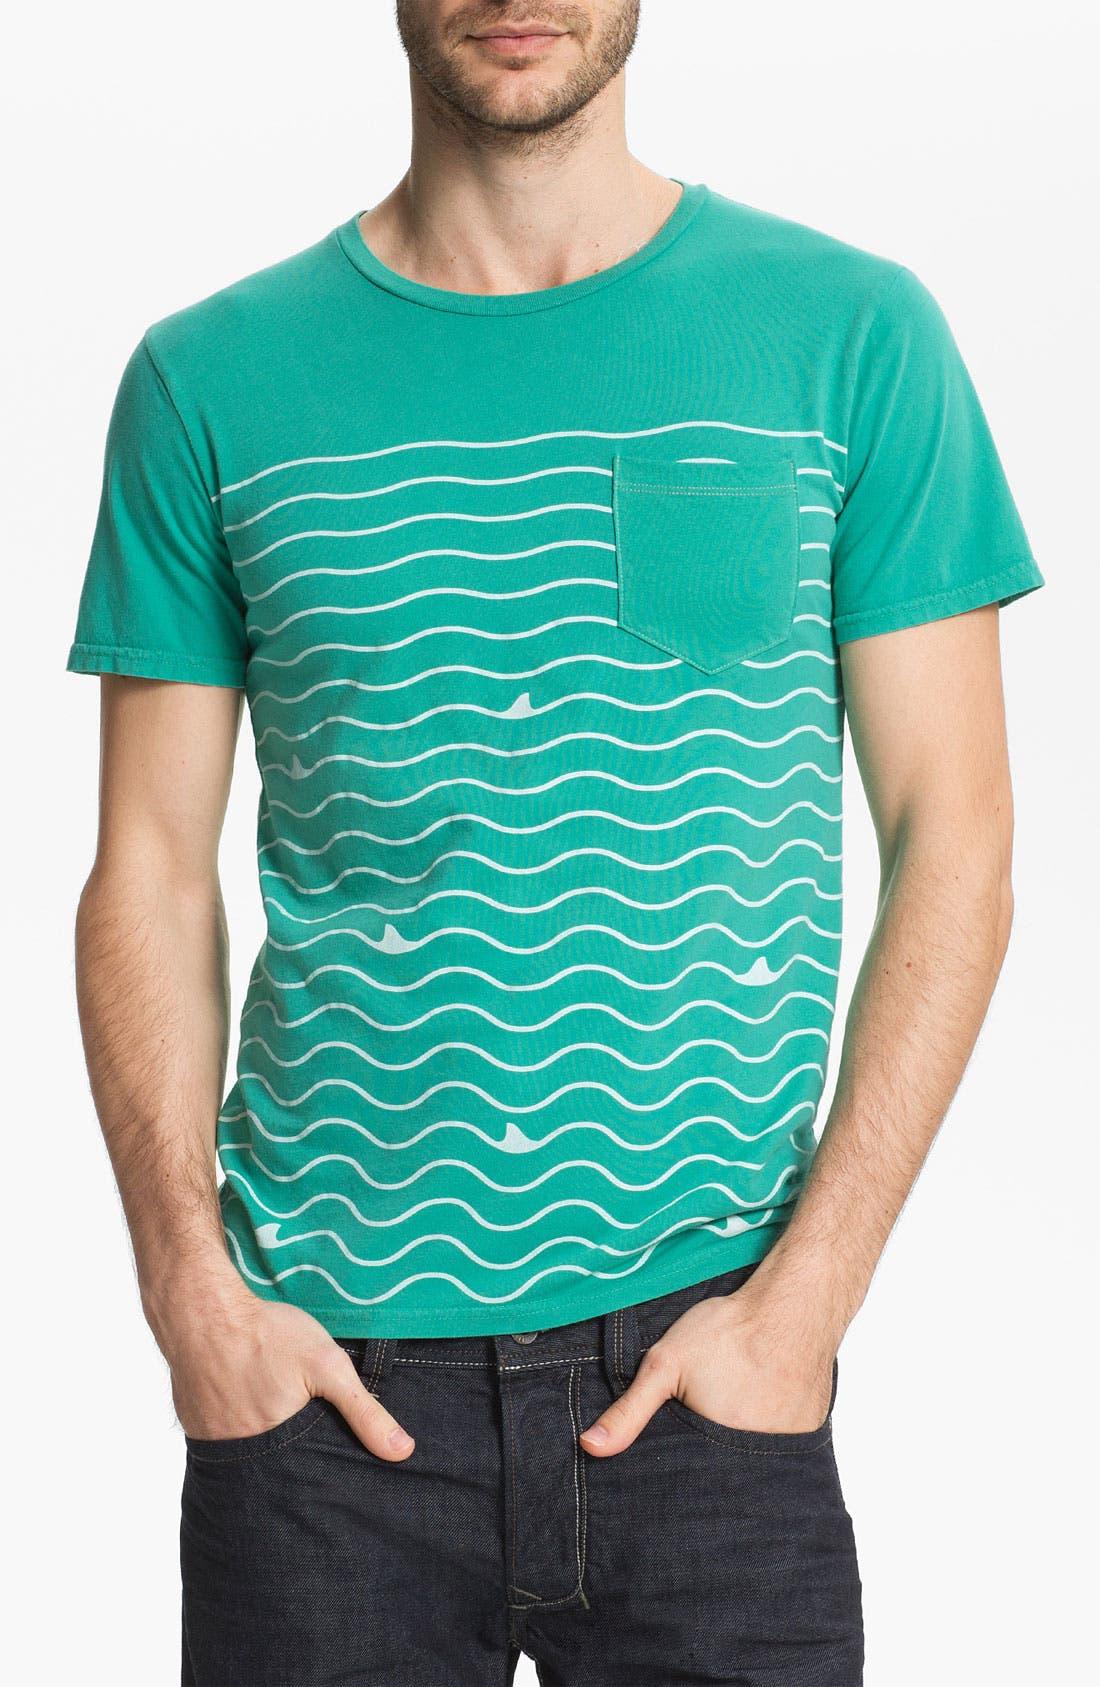 Main Image - Altru 'Shark Lines' Pocket T-Shirt